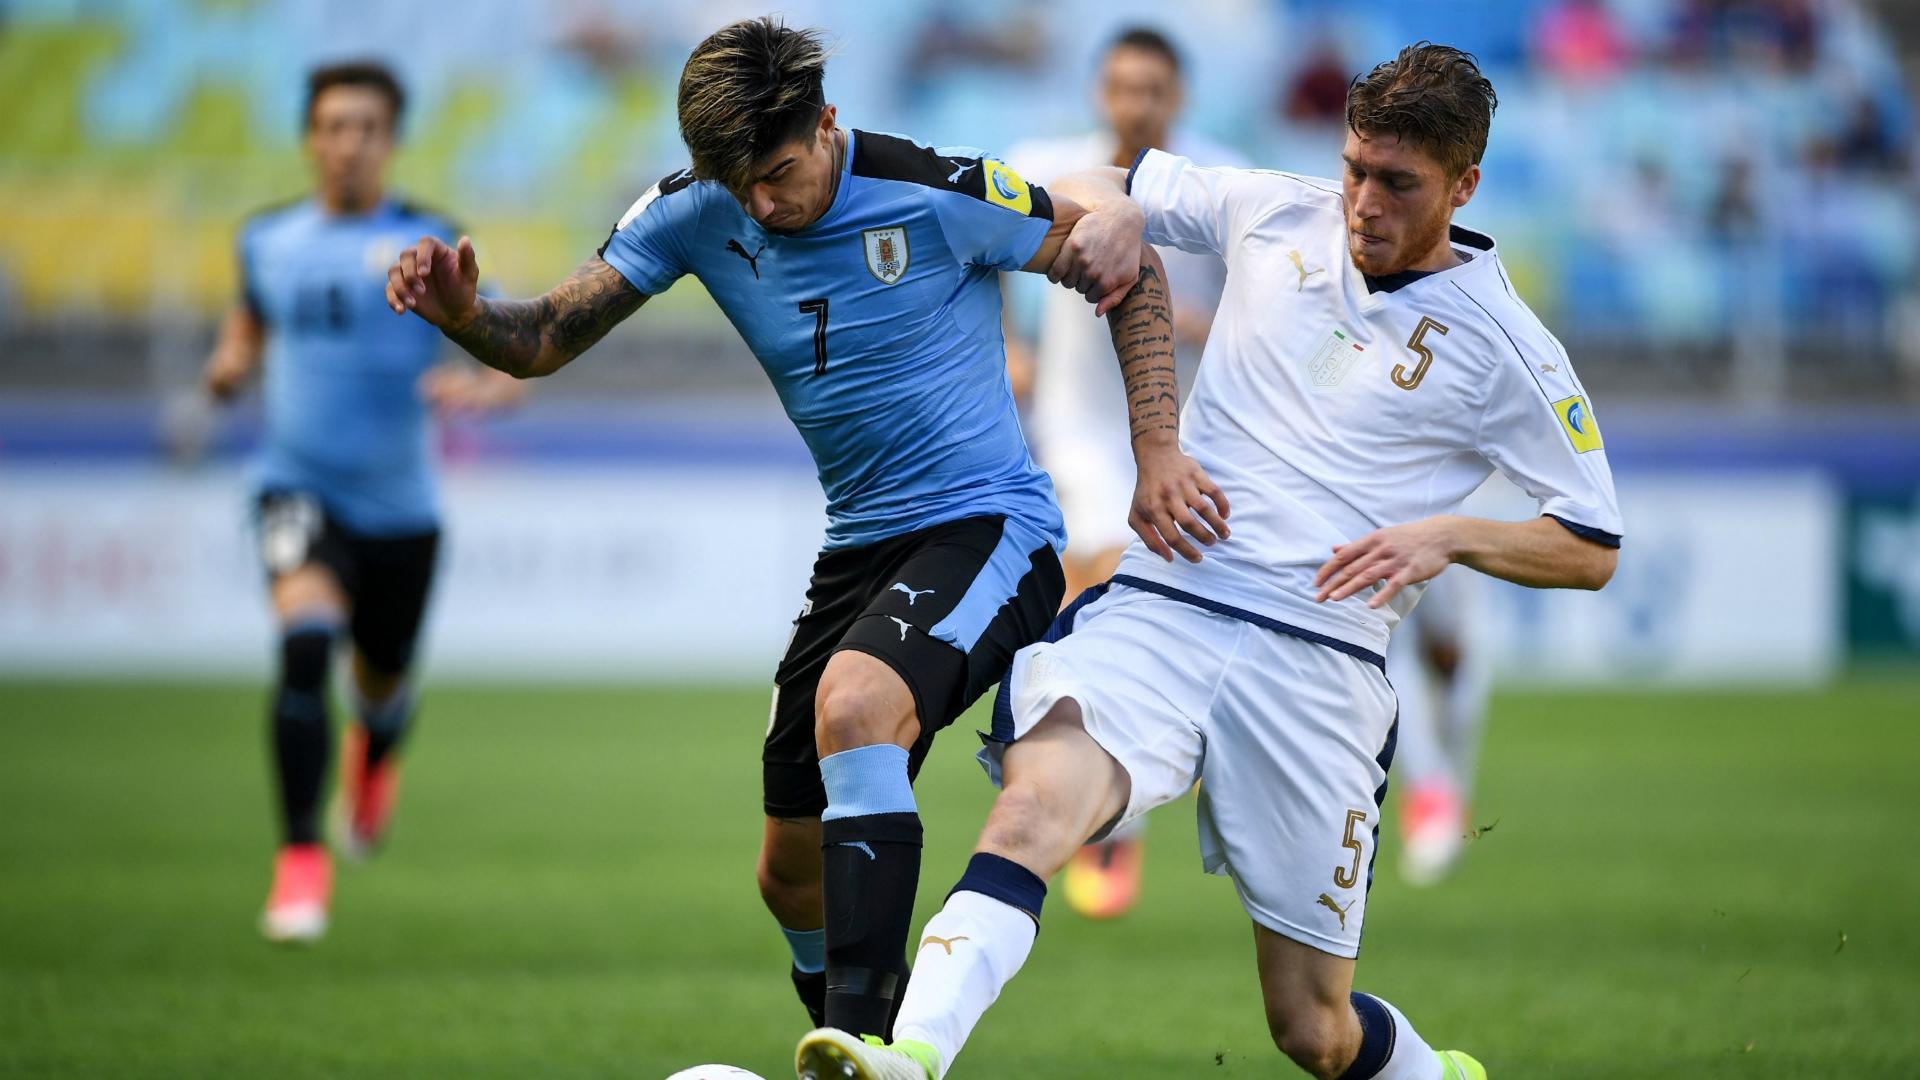 Joaquin Ardaiz Filippo Romagna Uruguay U20 Italy U20 U20 World Cup 06112017